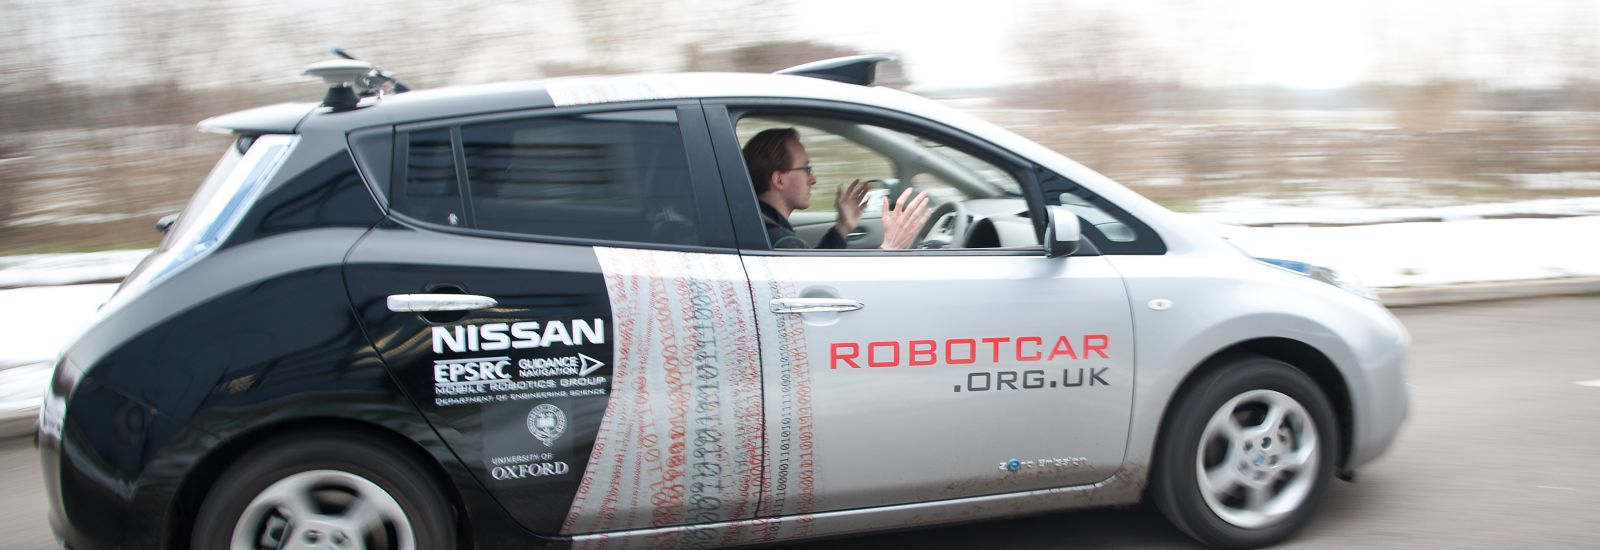 Robot Car autonomous driving, John Cairns